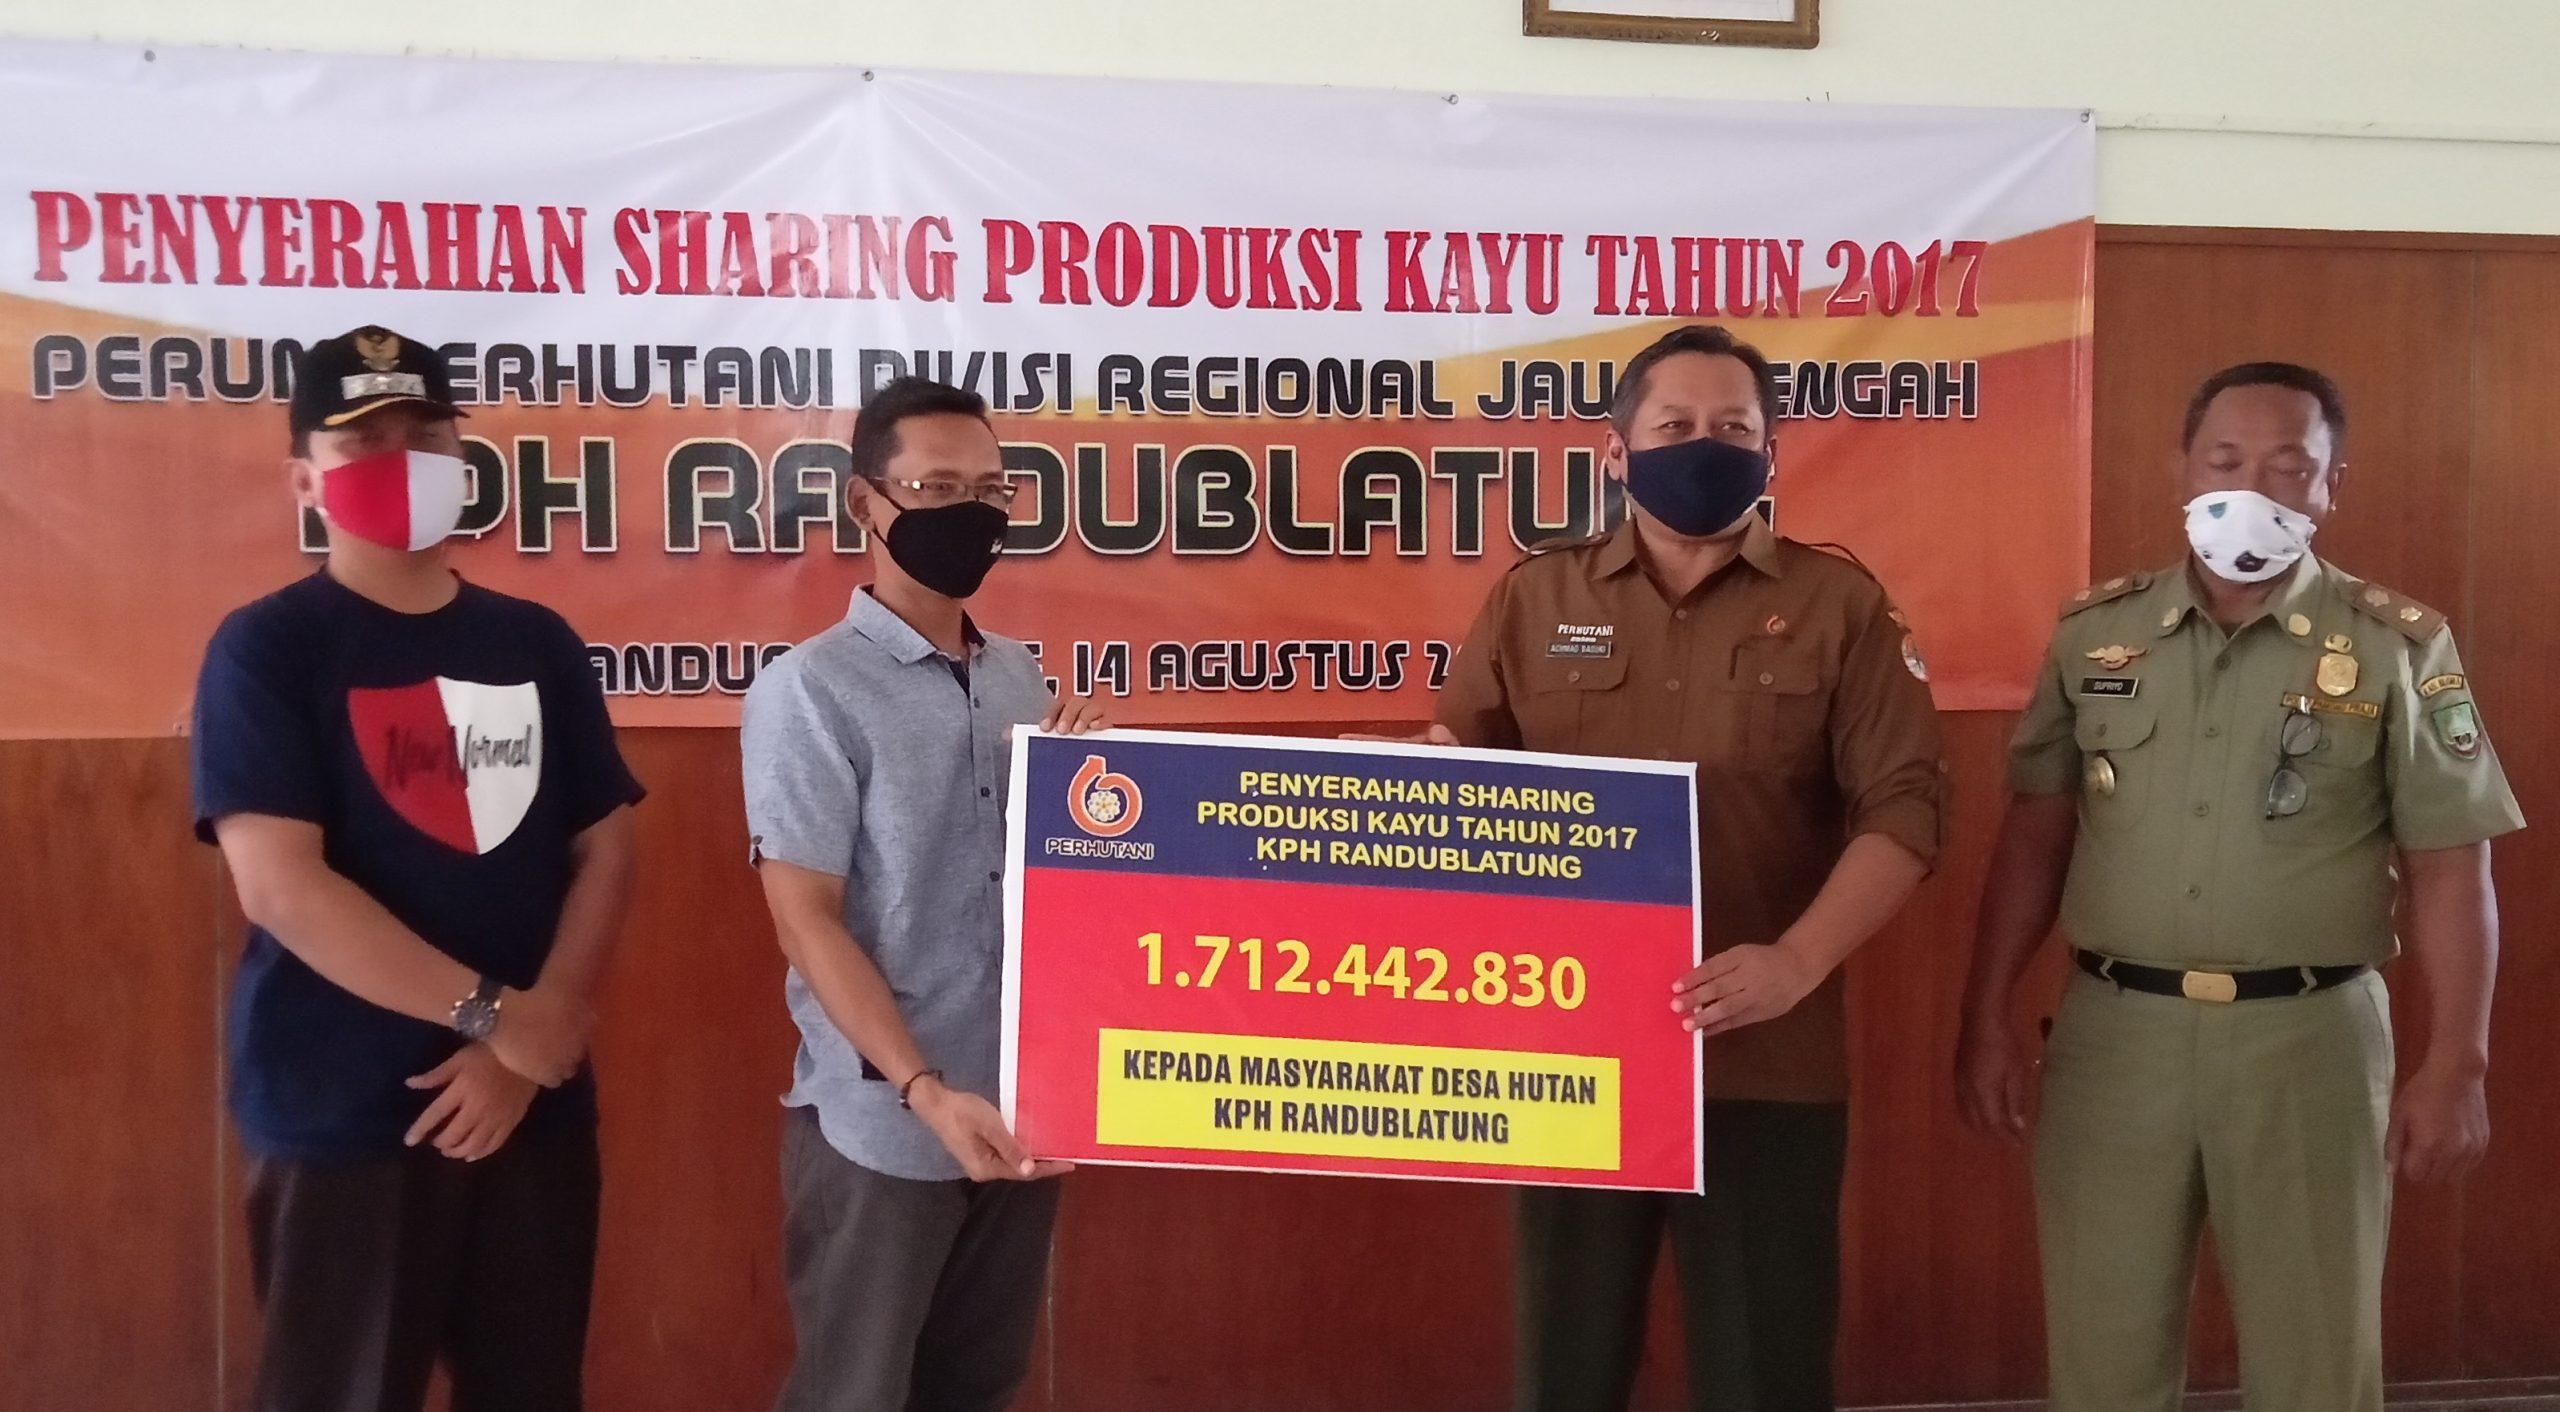 Photo of Perhutani KPH Randublatung Bagikan Rp 1,7 Milyar untuk 23 LMDH